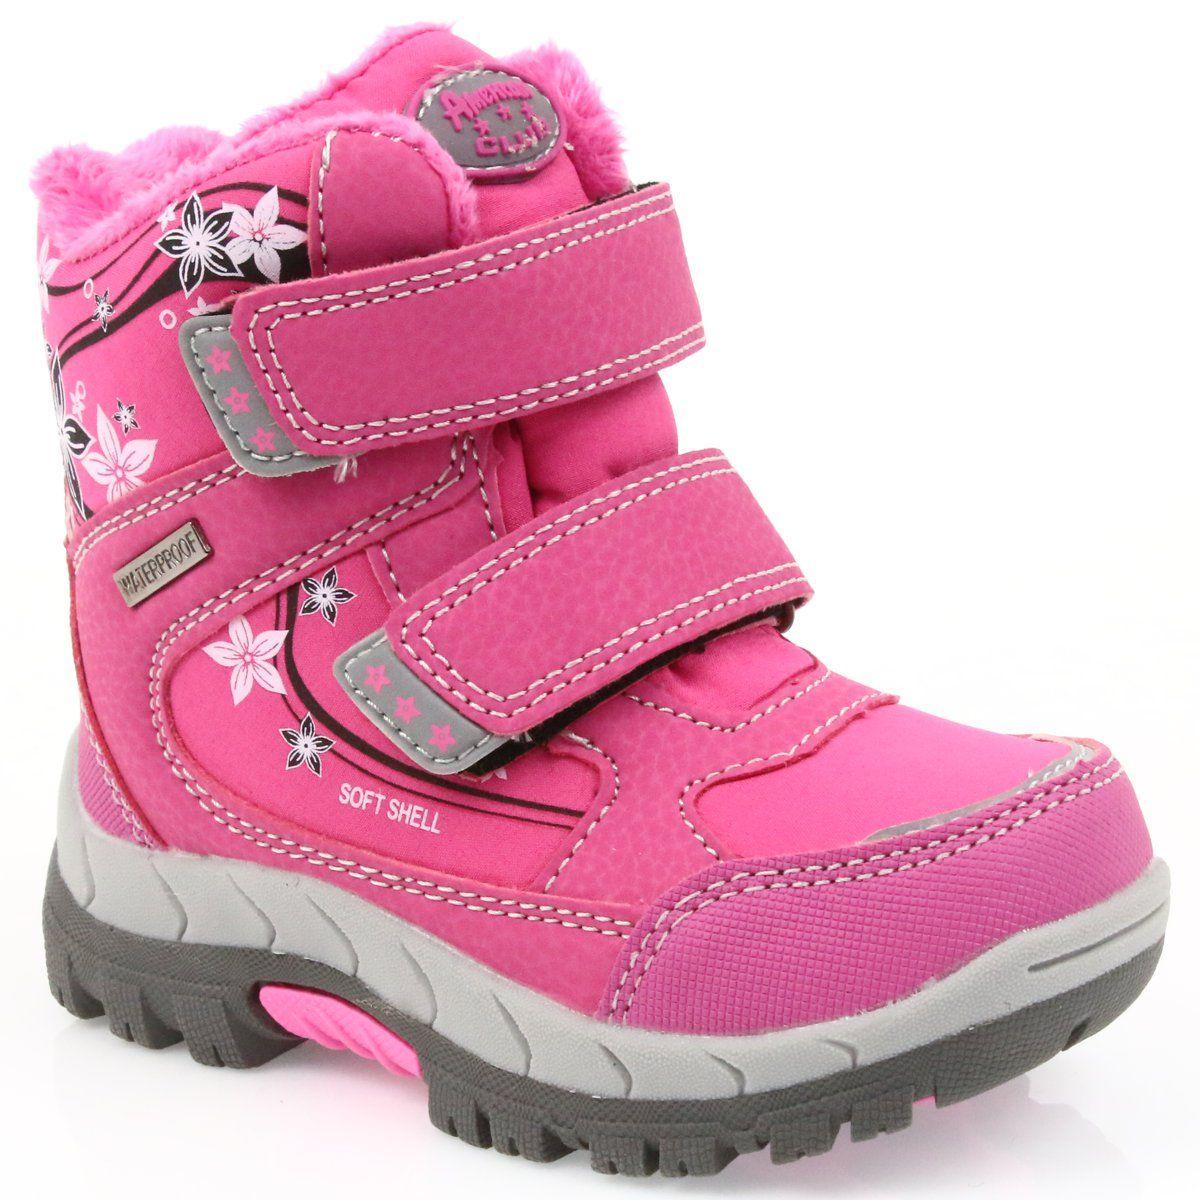 Kozaki Dla Dzieci Americanclub American Club Buty Z Membrana American 3121 Rozowe Wedge Sneaker Shoes Sneakers